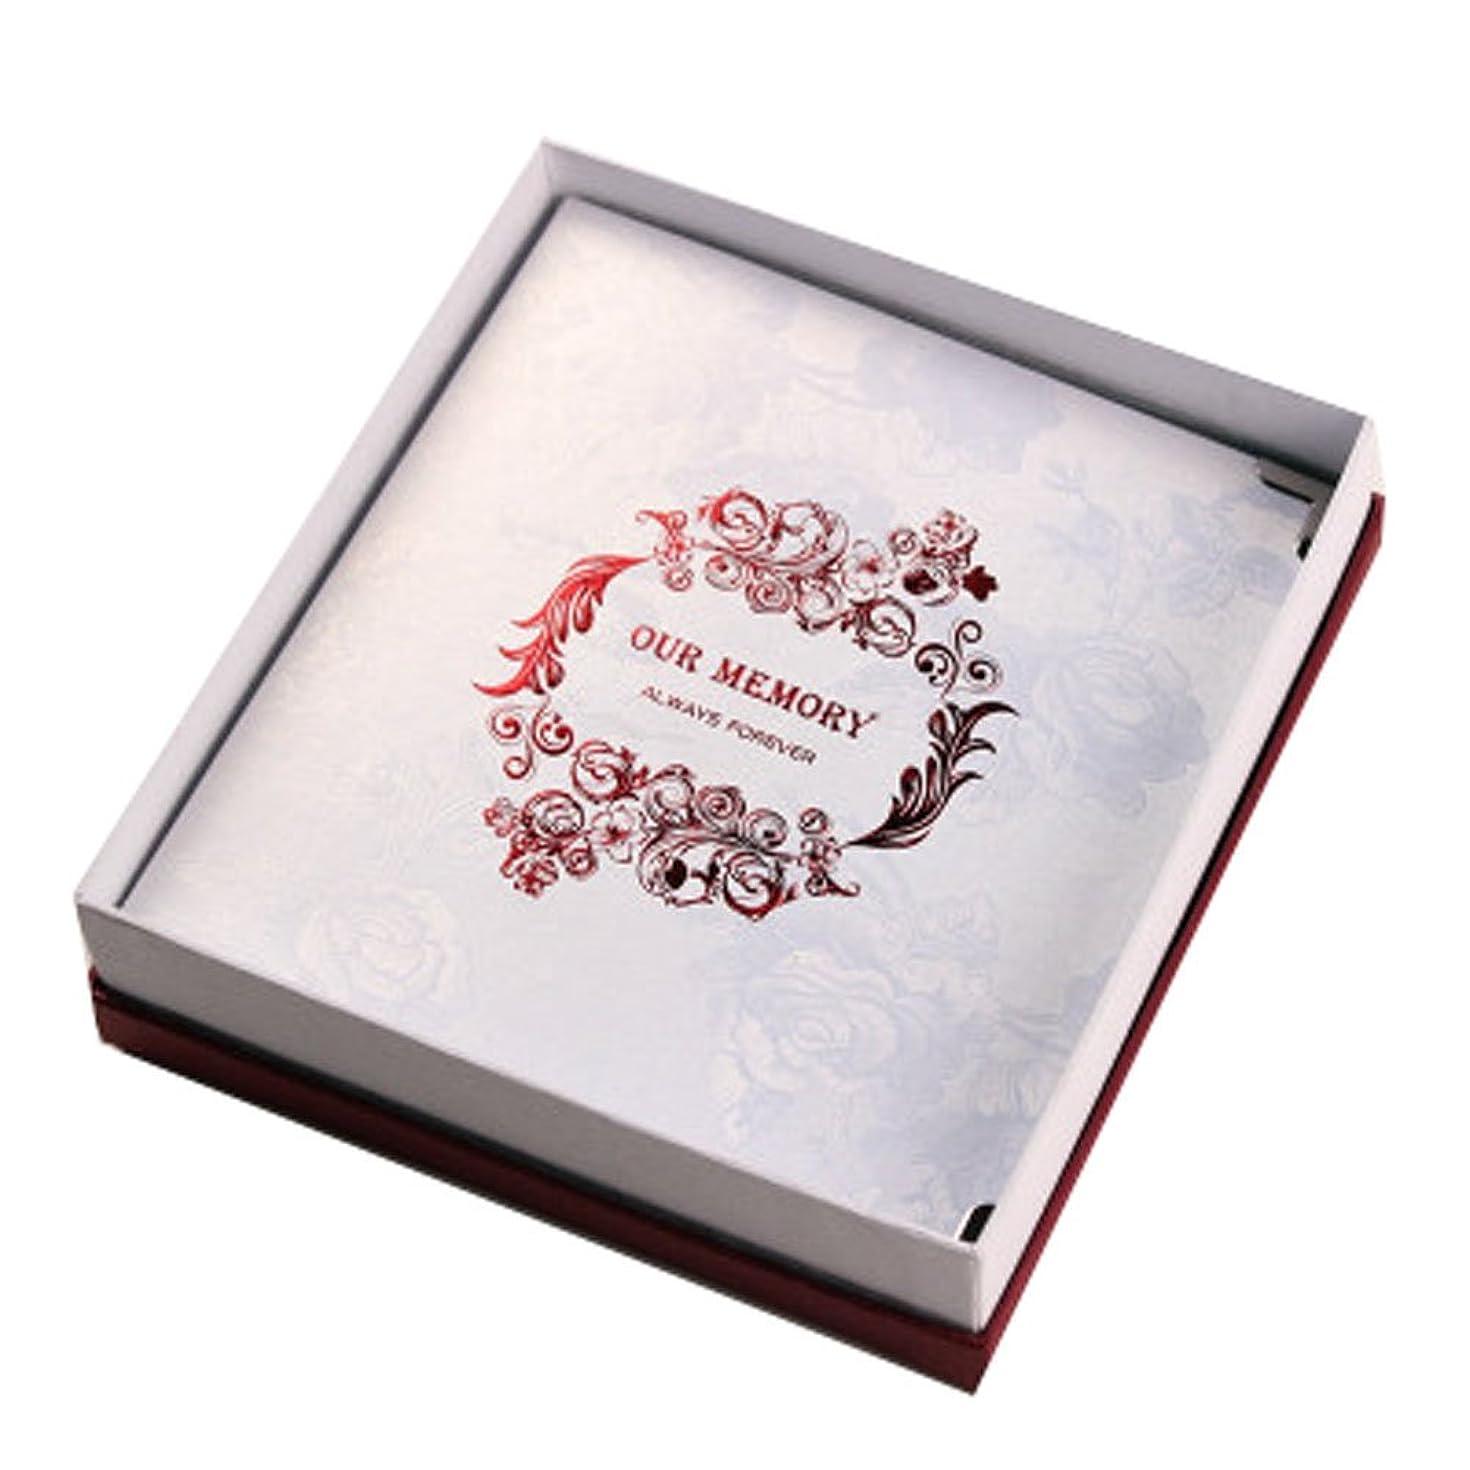 DRAGON SONIC Gift Box Upright Manual Diy Photo Album Creative Album Love Album-Our Memory